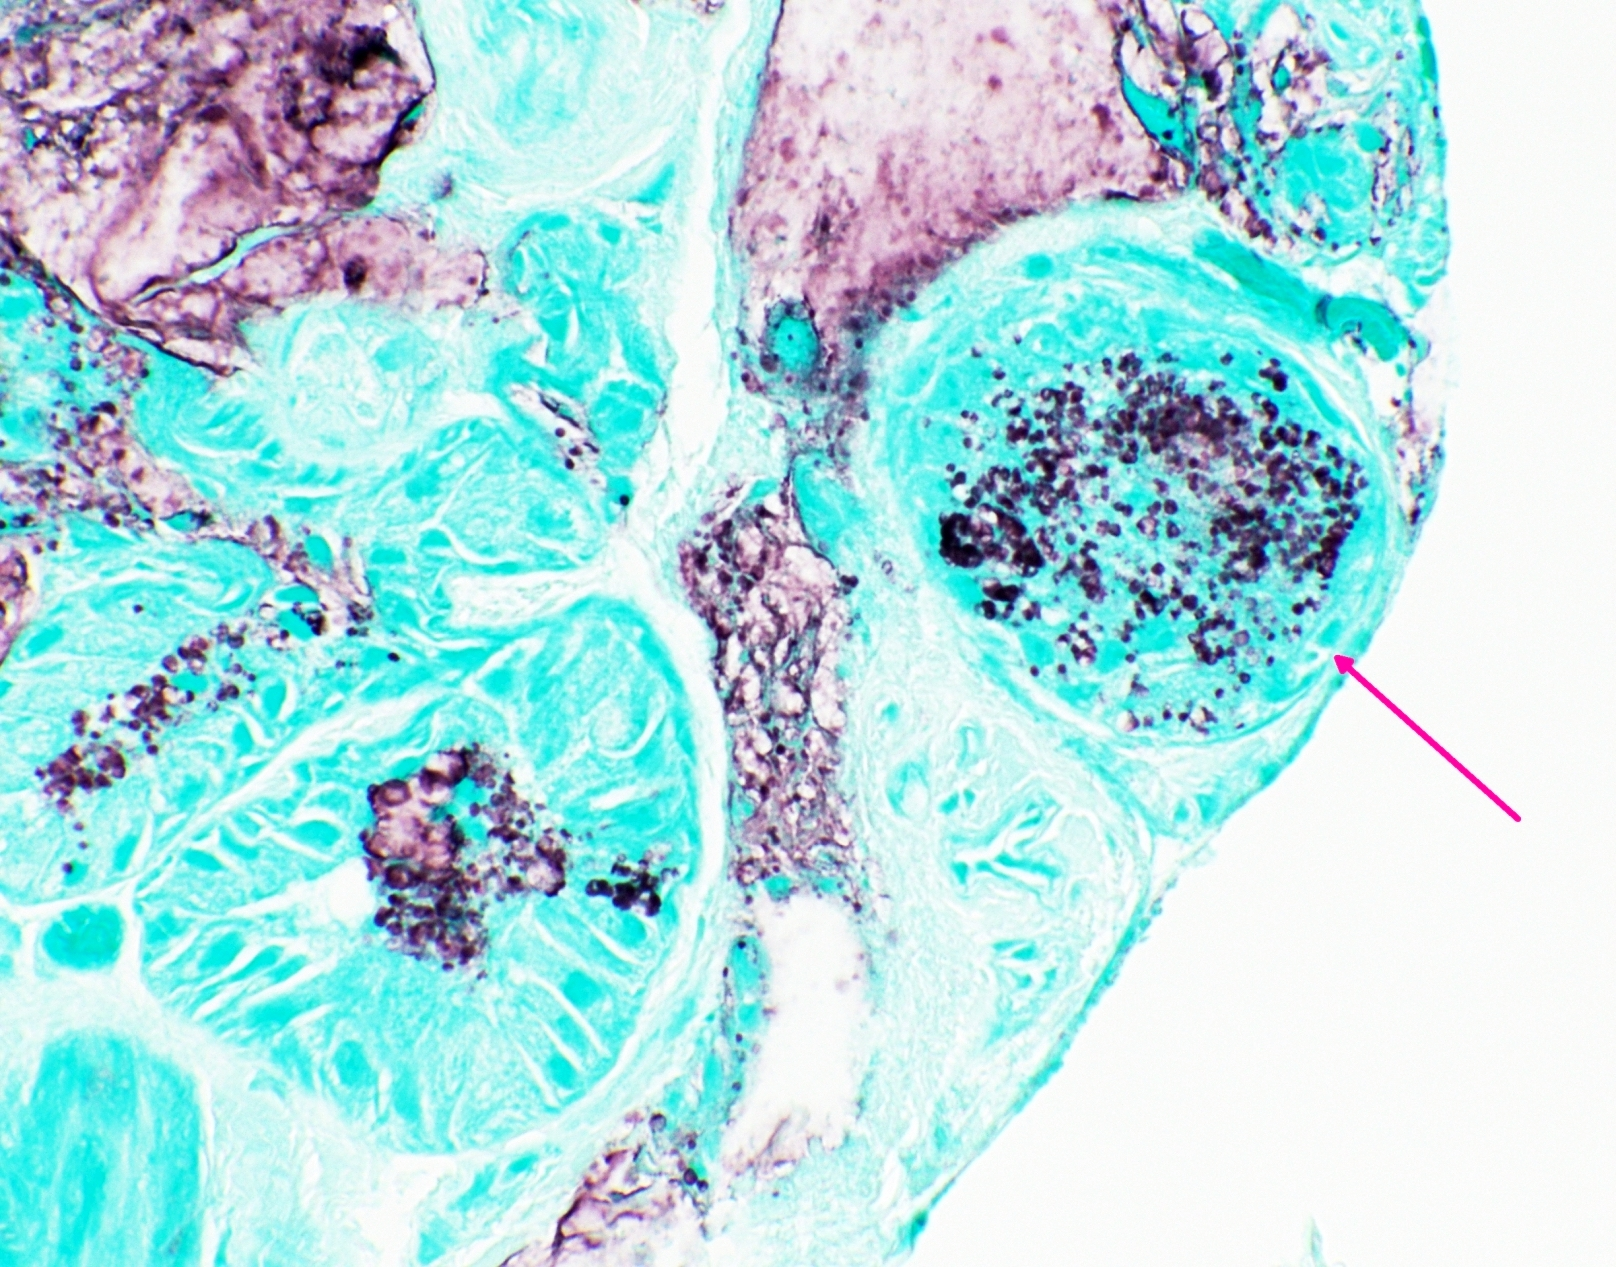 Cytoplasmic mucin, peribronchial glands